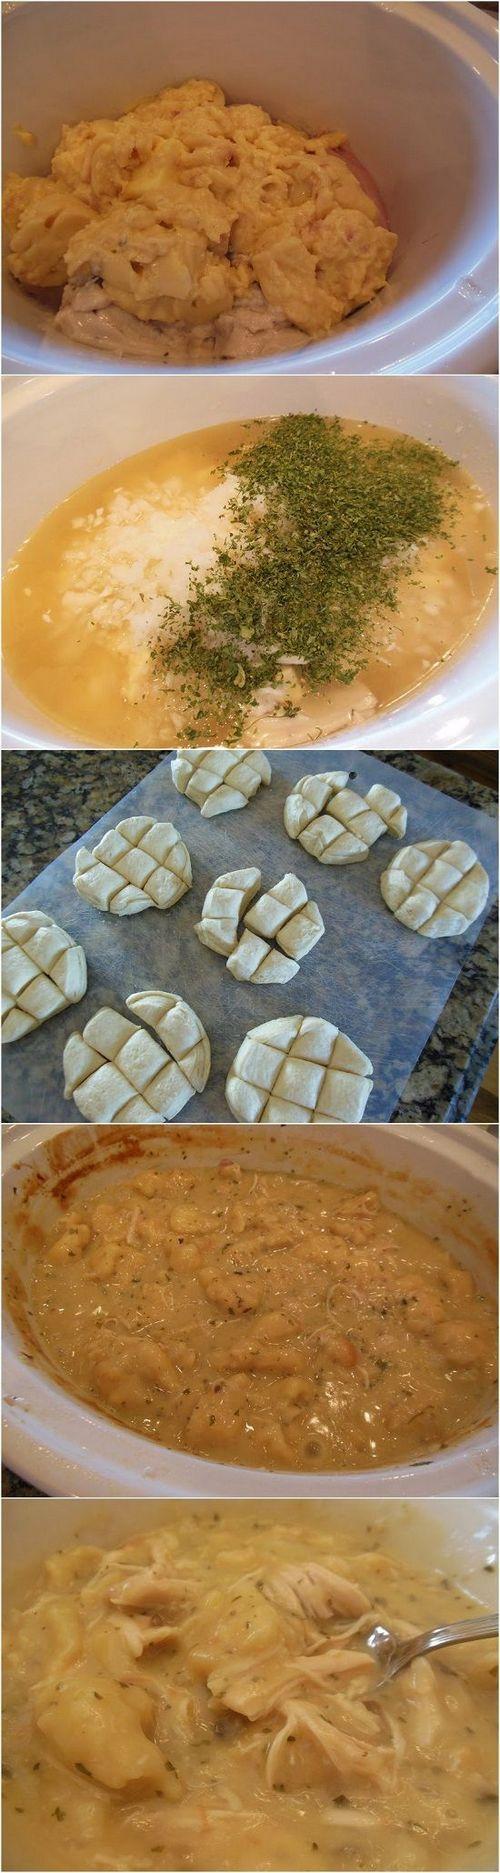 Crockpot Chicken Dumplings – Truelifekitchen I need to make this! Super easy